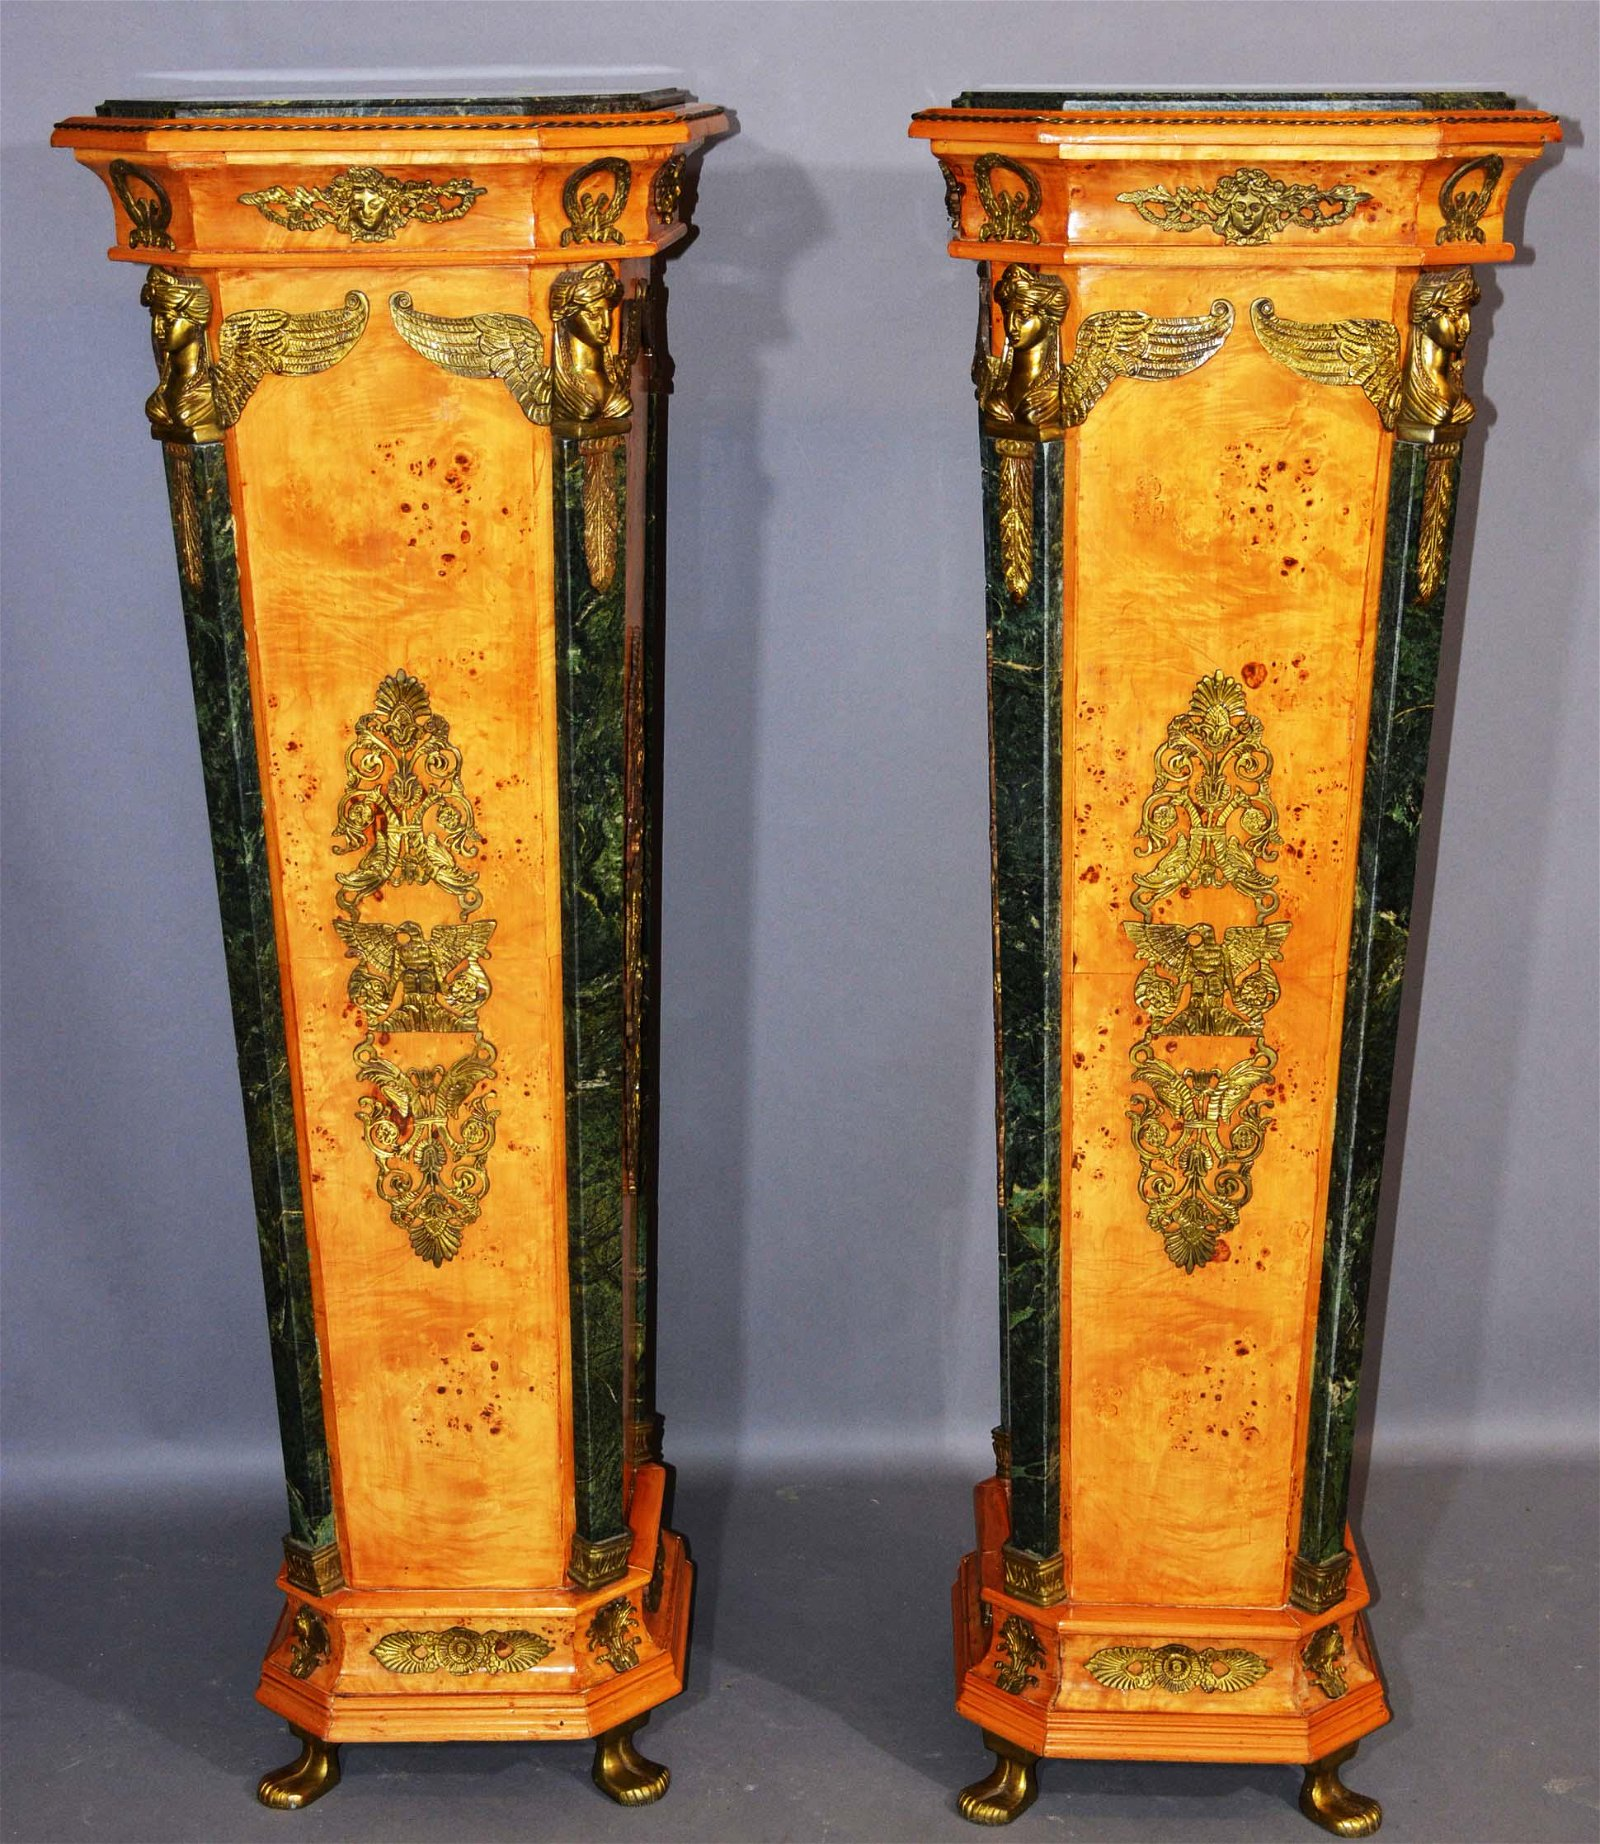 Pair of Italian Renaissance Style Pedestals